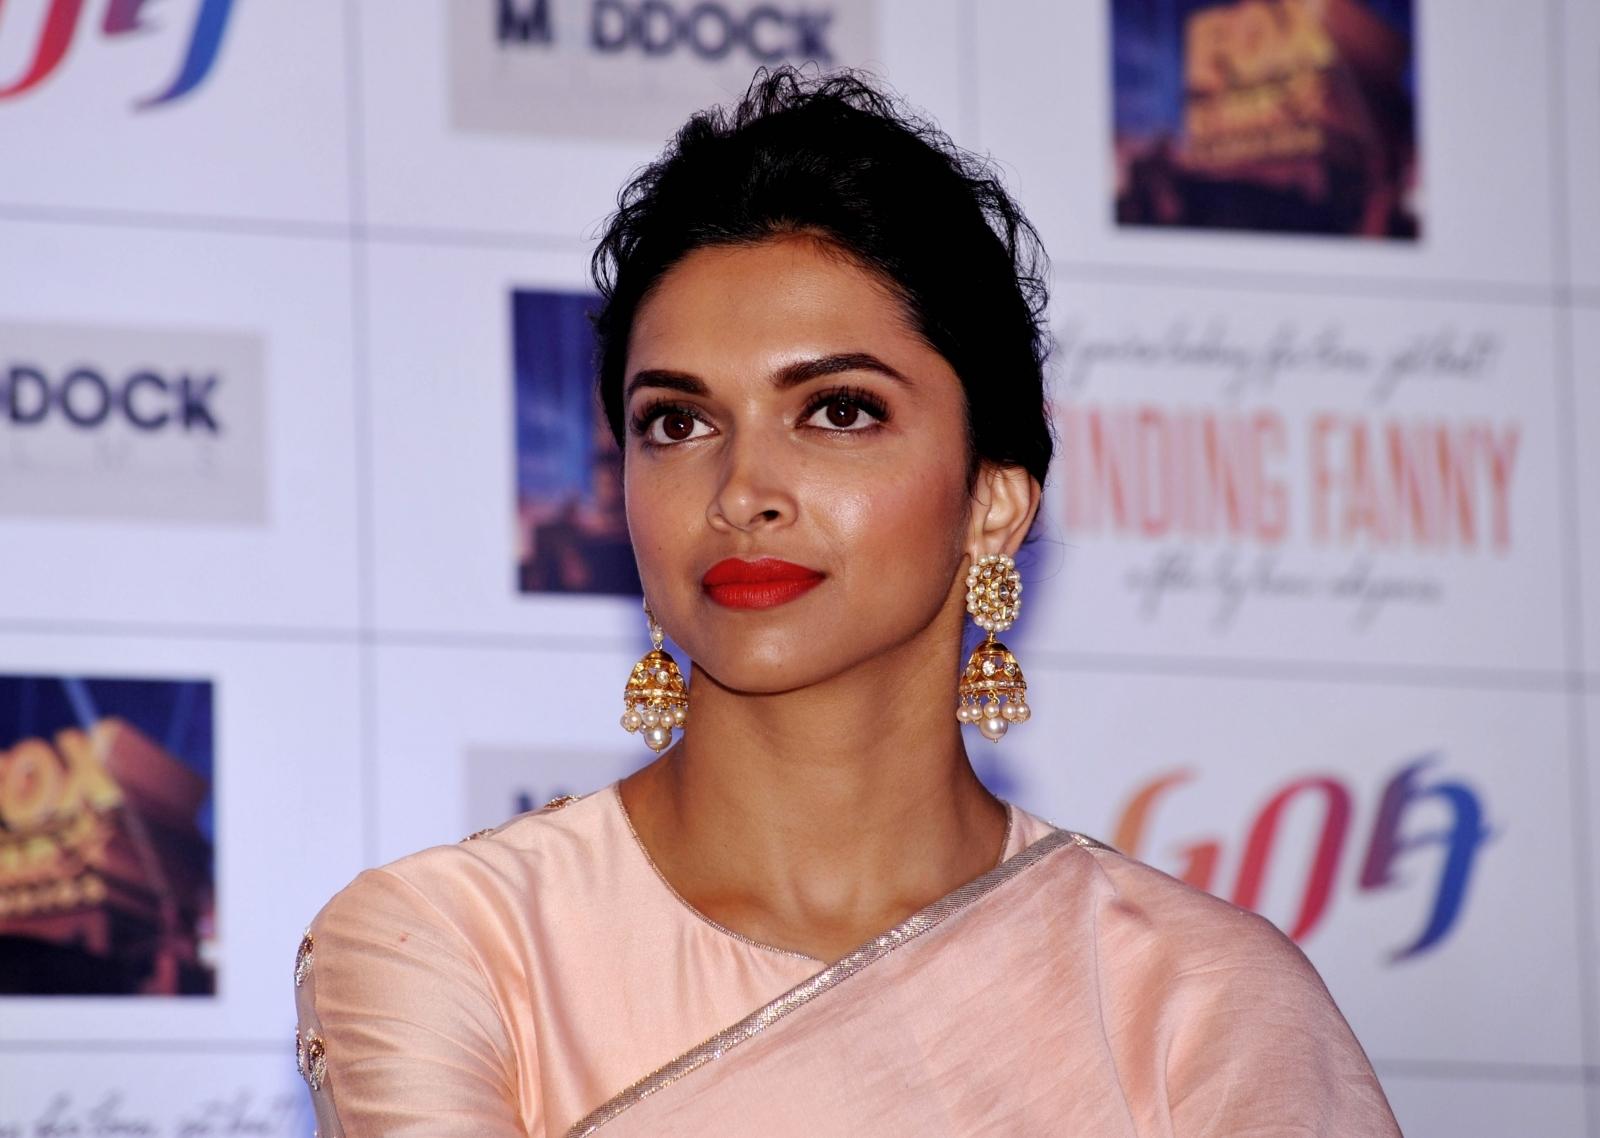 Did Deepika Padukone Act With Jyothika In A South Indian: Deepika Padukone's Padmavati Row: Indian Politician